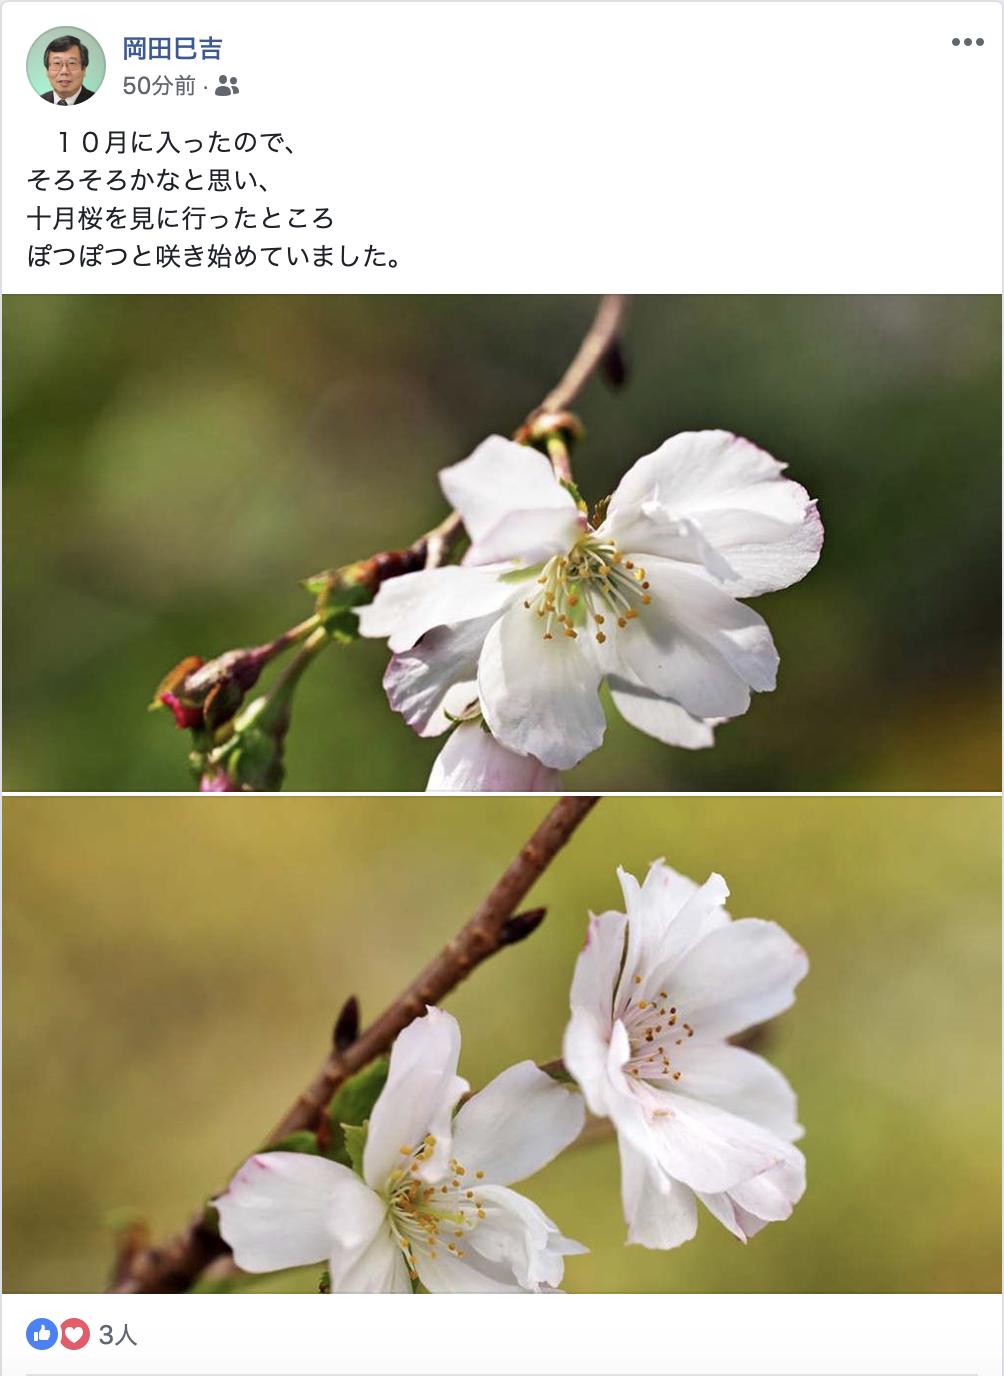 Hirosaki hanaikada 201801